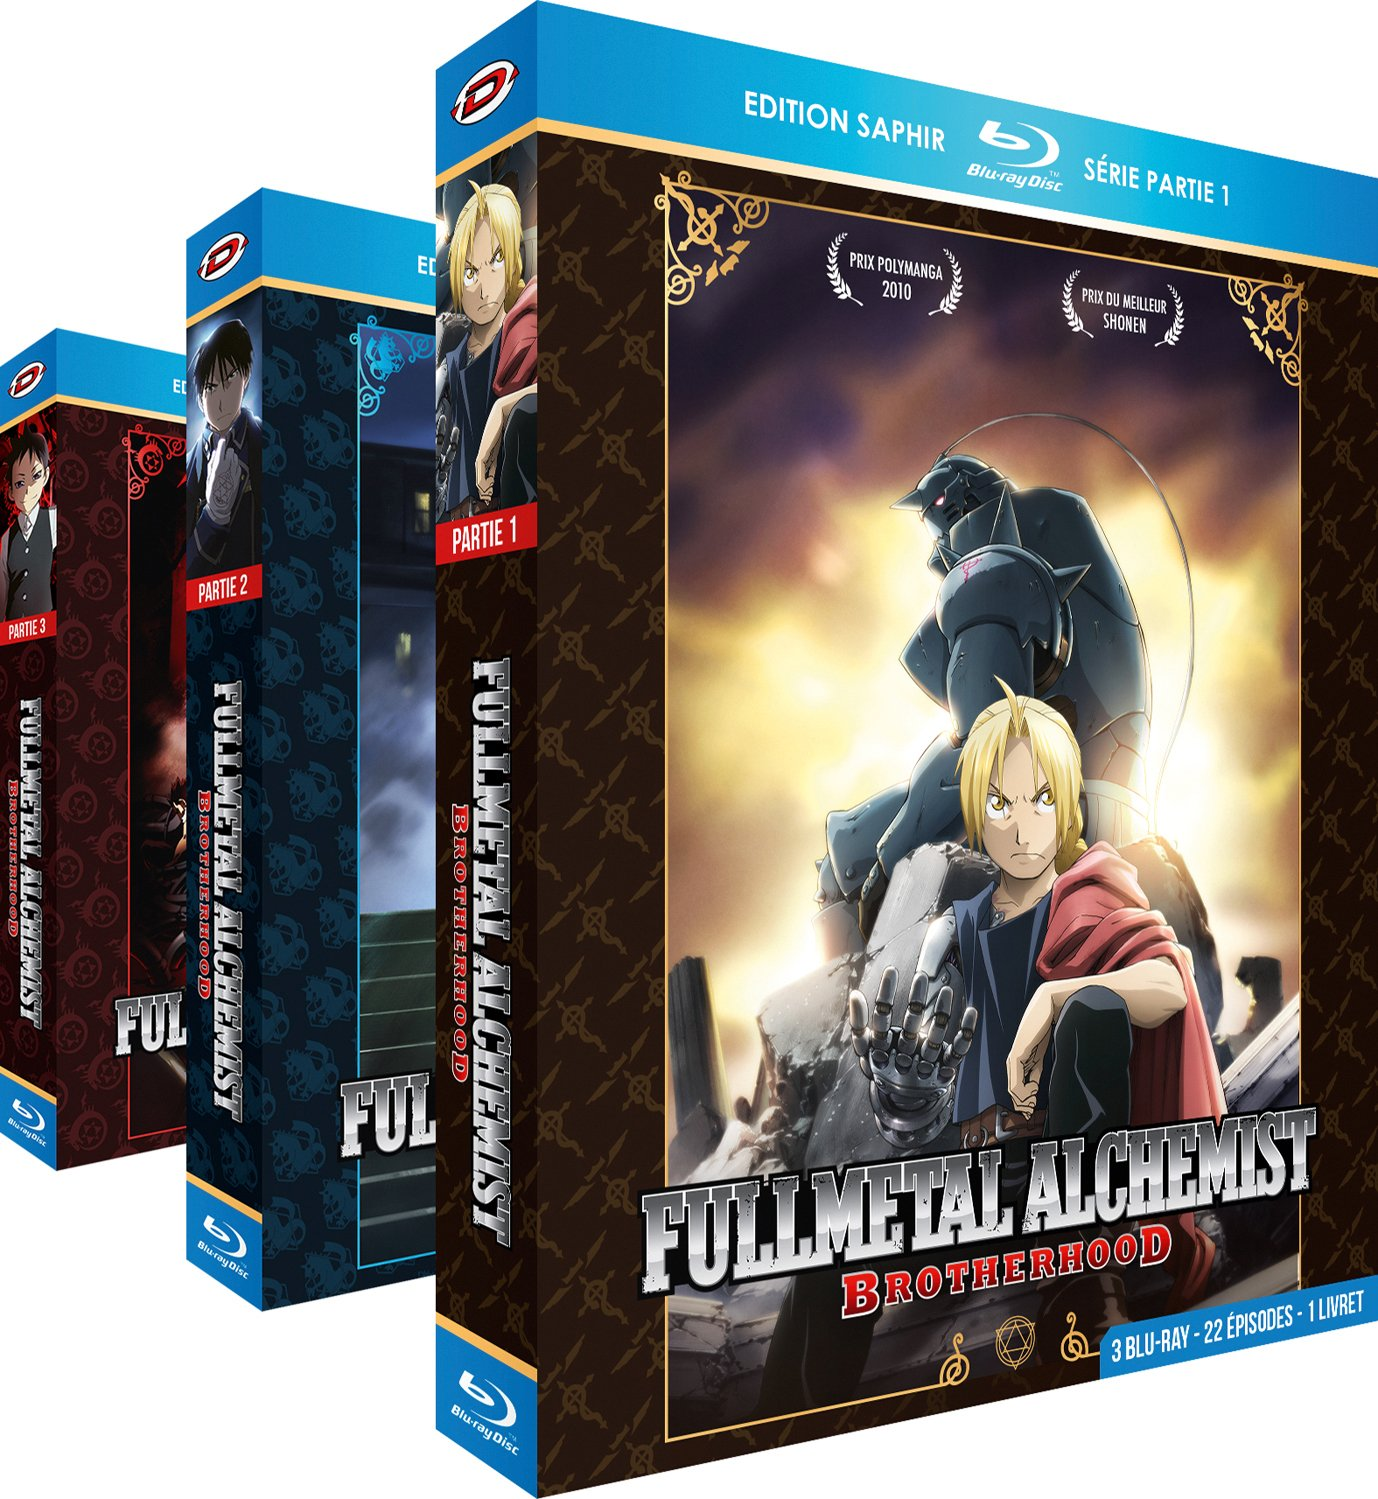 Fullmetal Alchemist: Brotherhood - Intégrale + OAVs - Edition Saphir - 9 Blu-ray + Livrets Francia Blu-ray: Amazon.es: Hiromu Arakawa, Yasuhiro Irie, Bones: Cine y Series TV